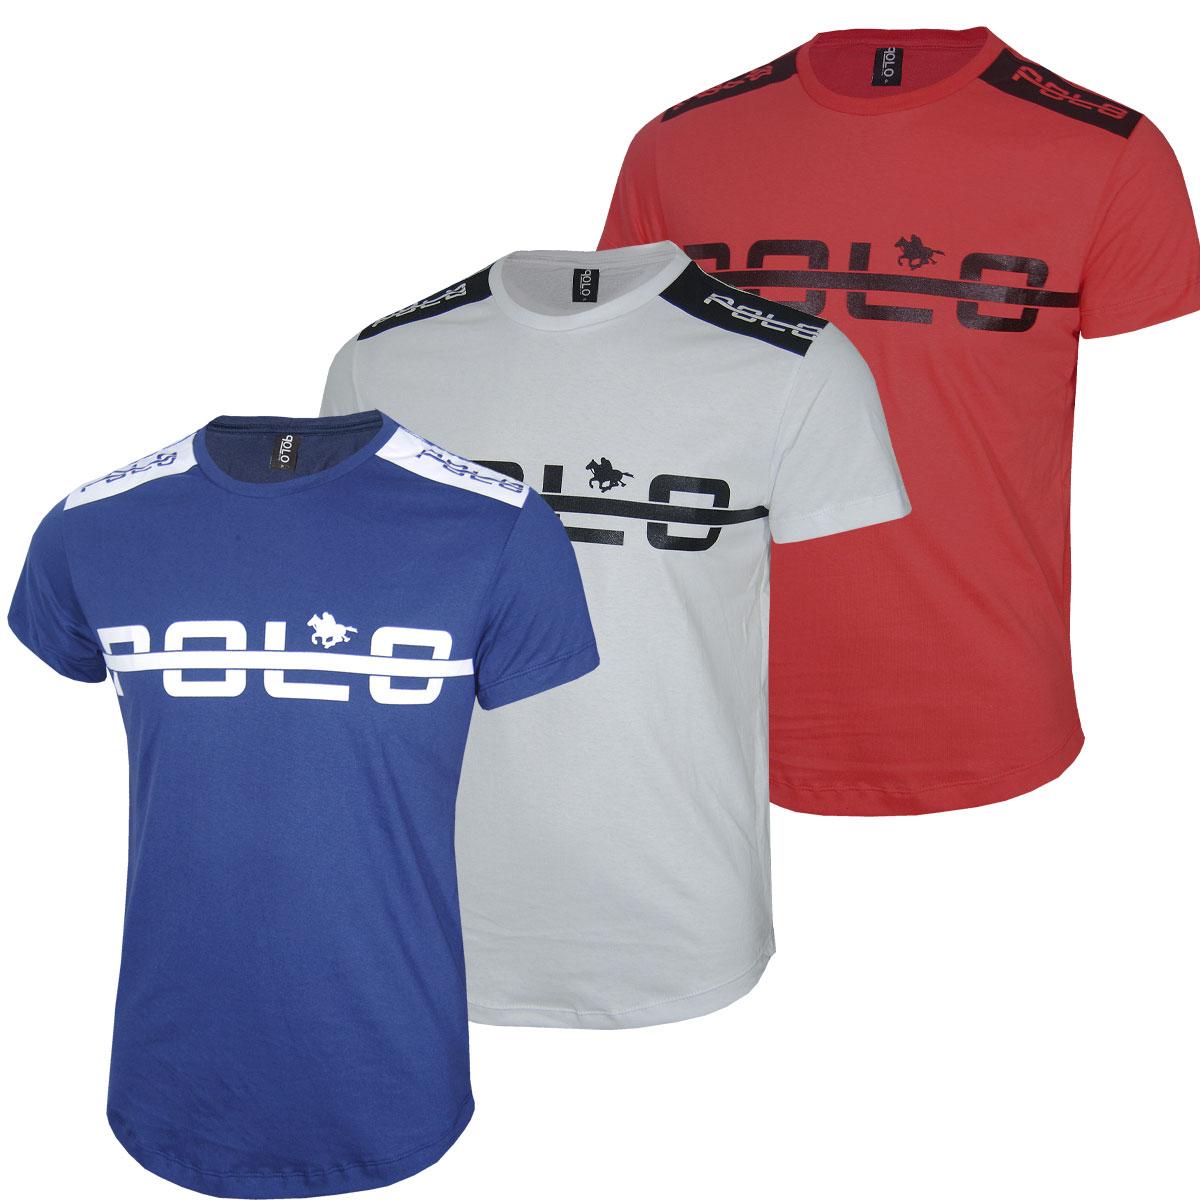 Kit Camisetas Maculinas Swag Long Line Polo Rg518